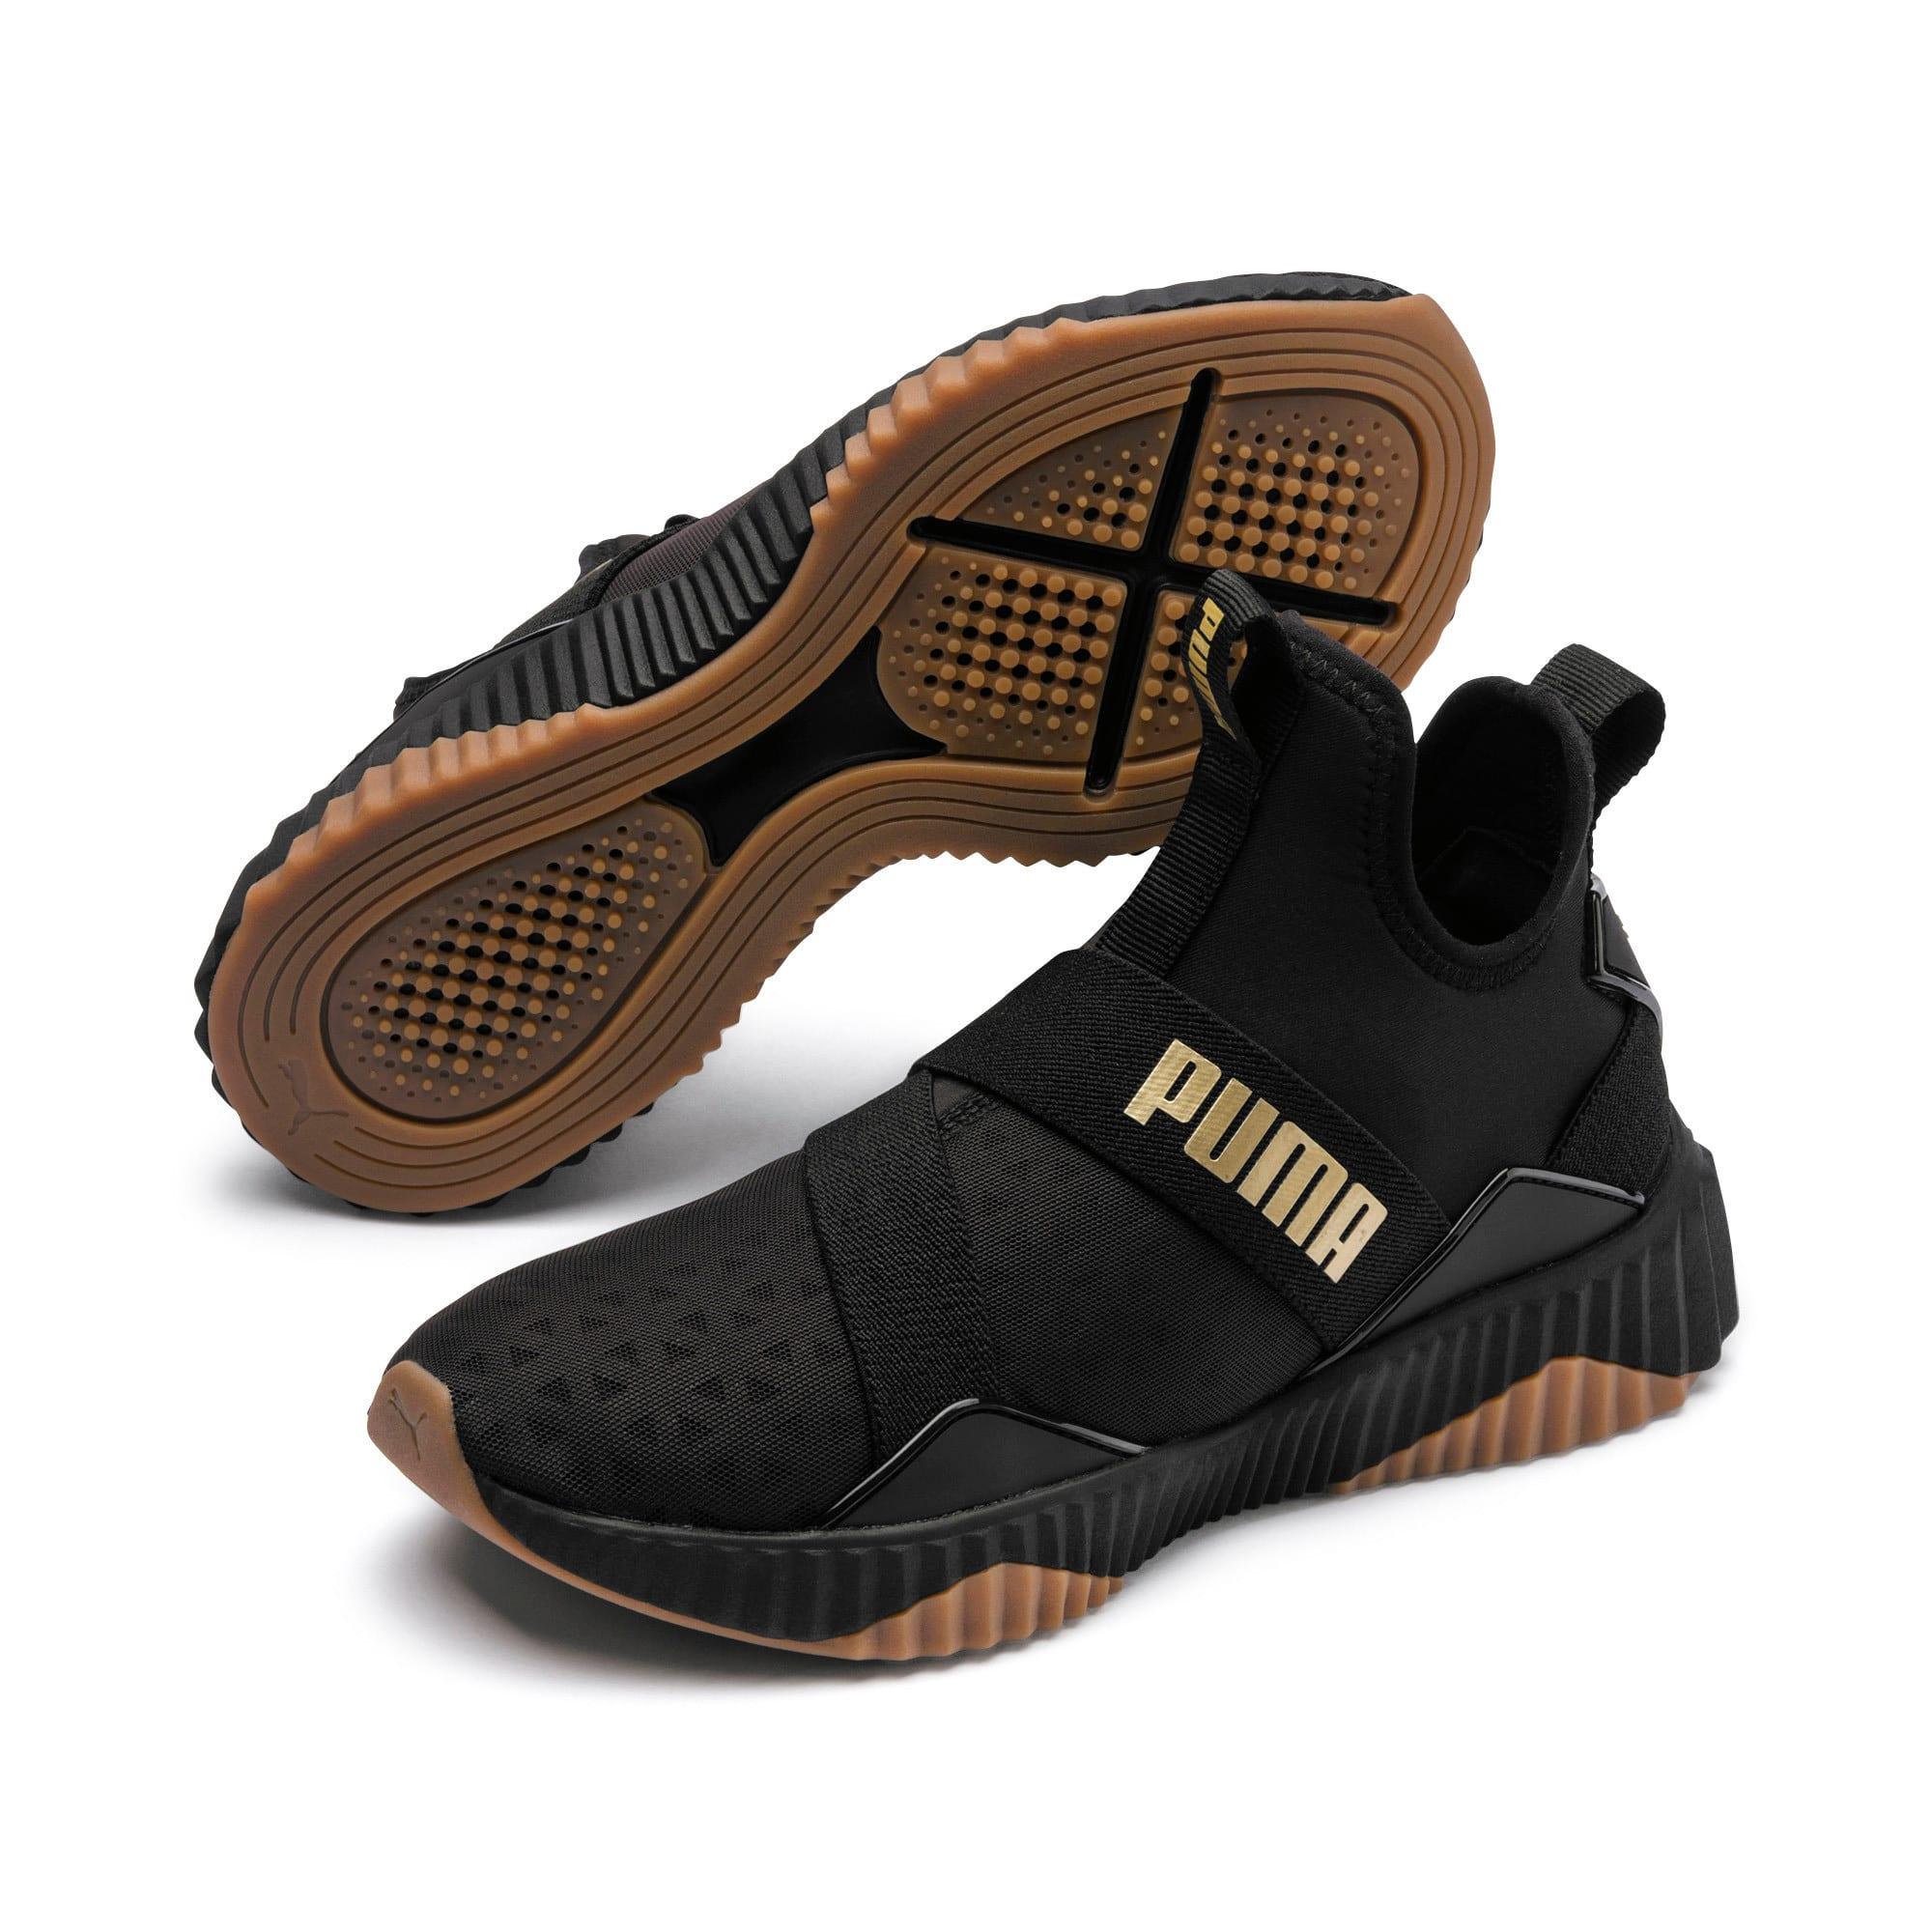 Thumbnail 3 of Defy Mid Sparkle Damen Sneaker, Puma Black-Metallic Gold, medium